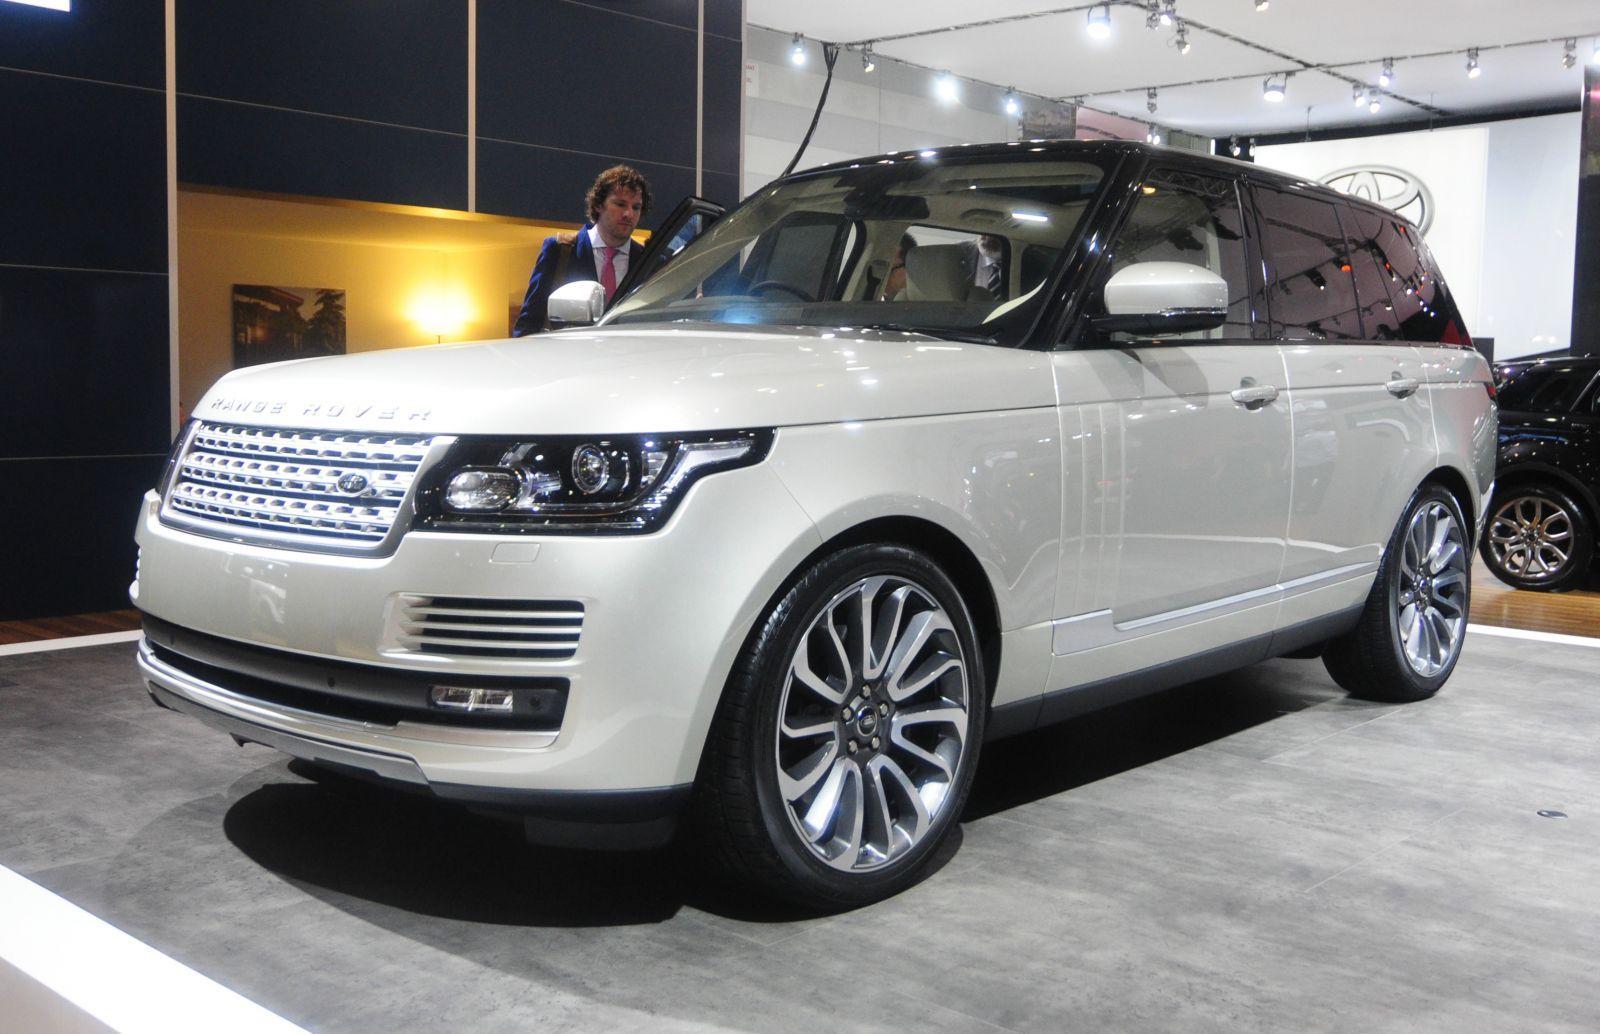 2013 Range Rover Unveiled At Australian International